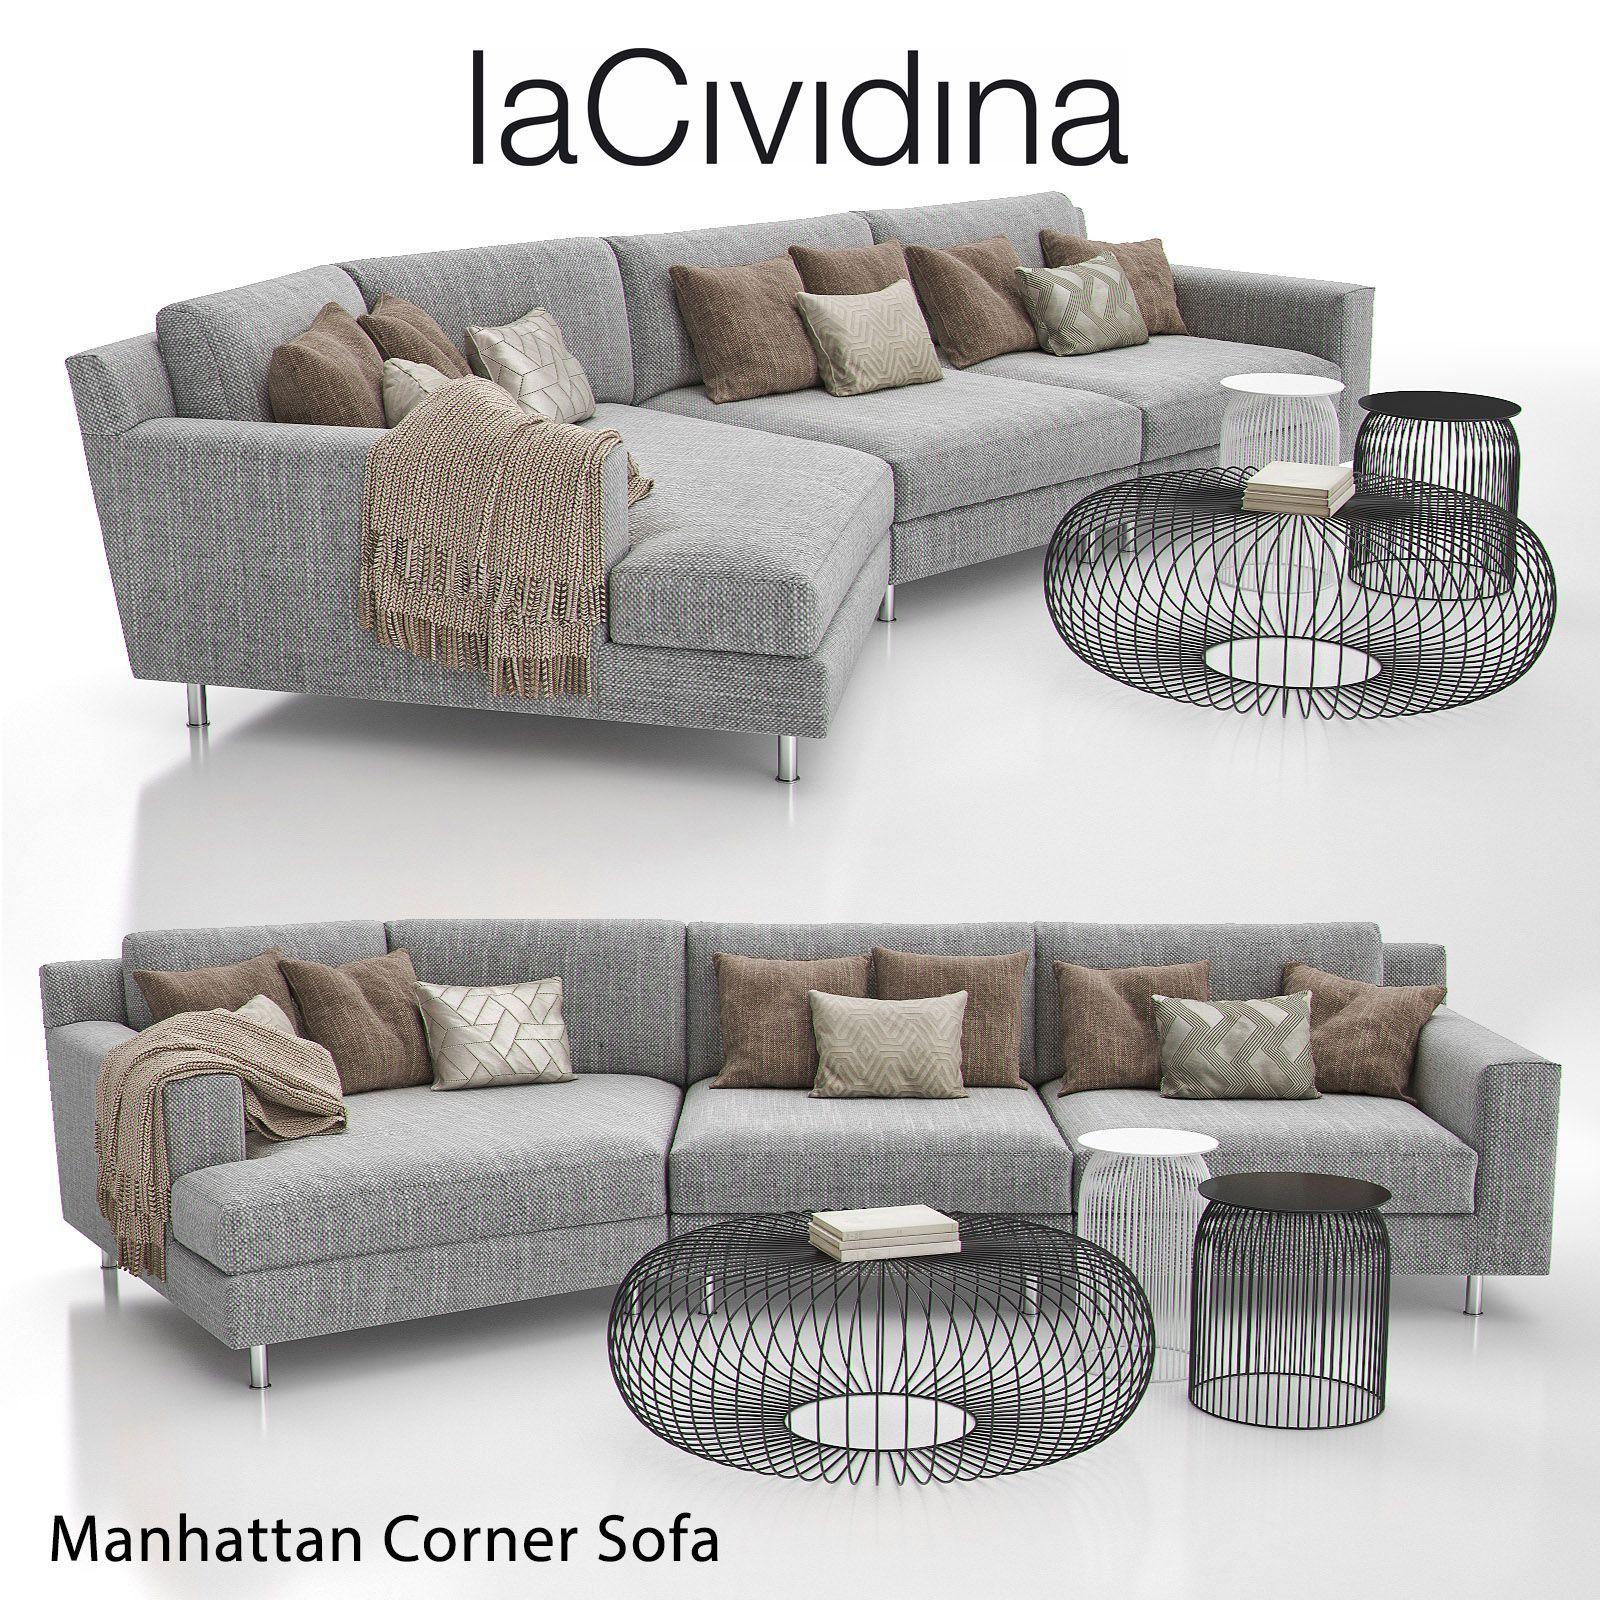 21 Elegante Modulare Leder Ecke Sofa Ecksofa Design Ecksofa Sofa